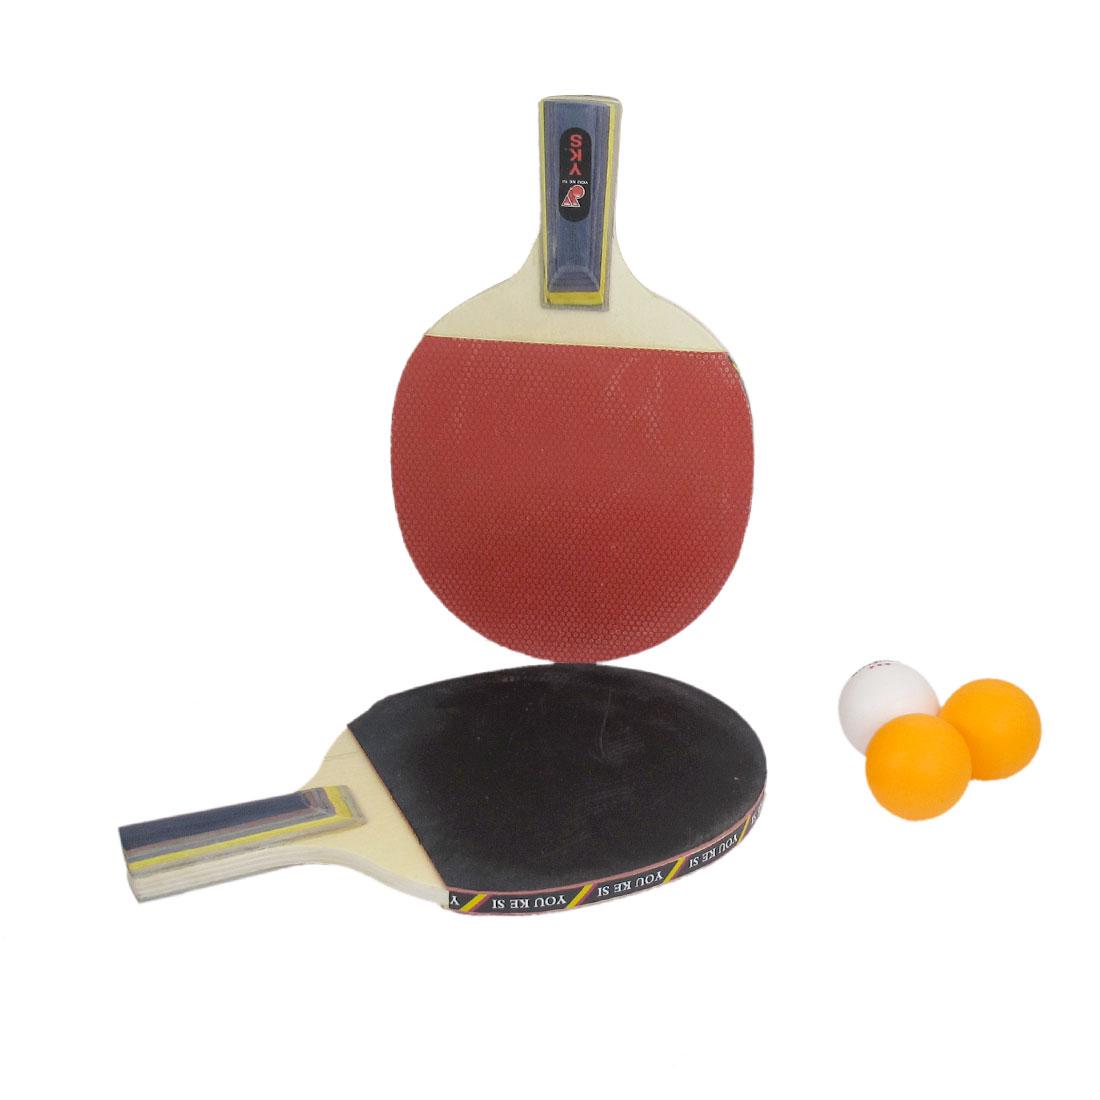 1 Pair Recreational Table Tennis Ping Pong Penhold Grip Racket Paddle w 3 Balls